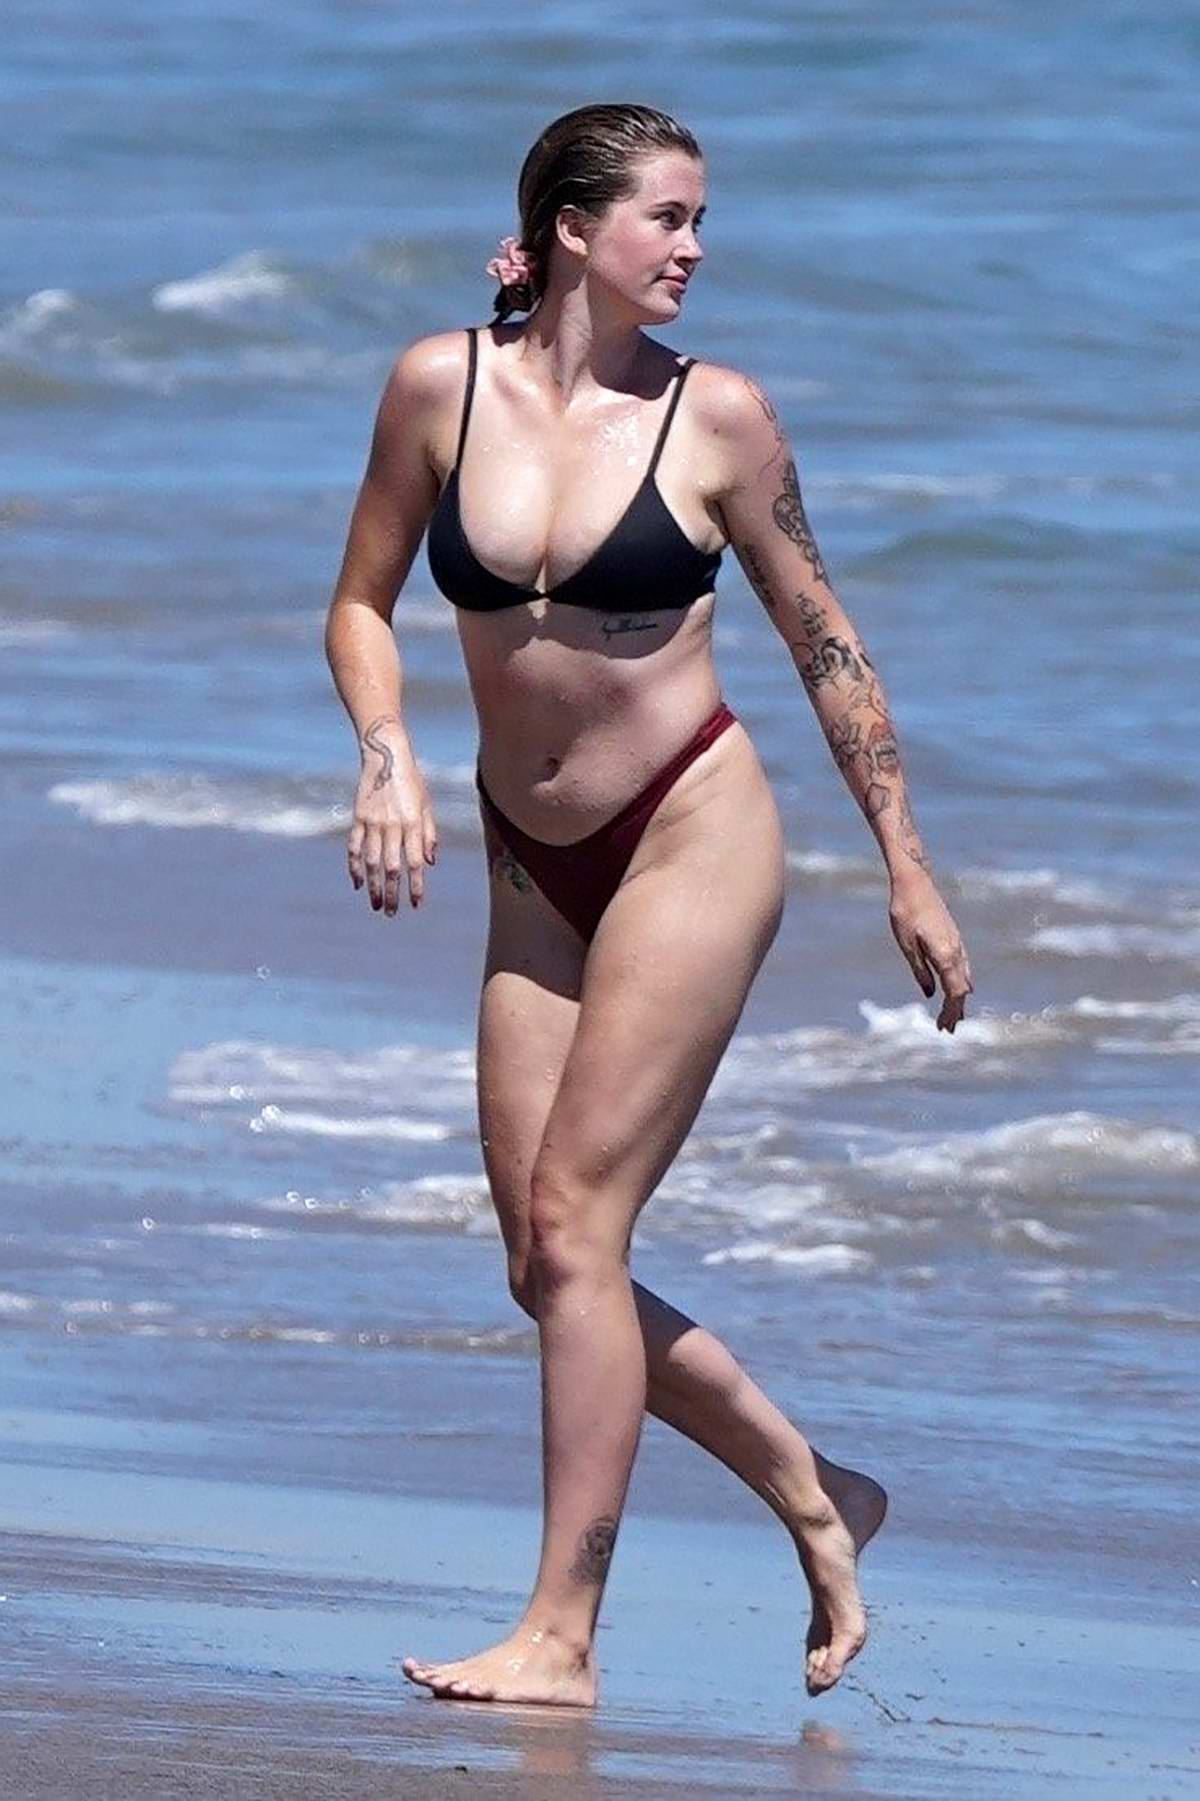 Ireland Baldwin seen wearing a bikini while enjoying a day with friends at the beach in Malibu, California